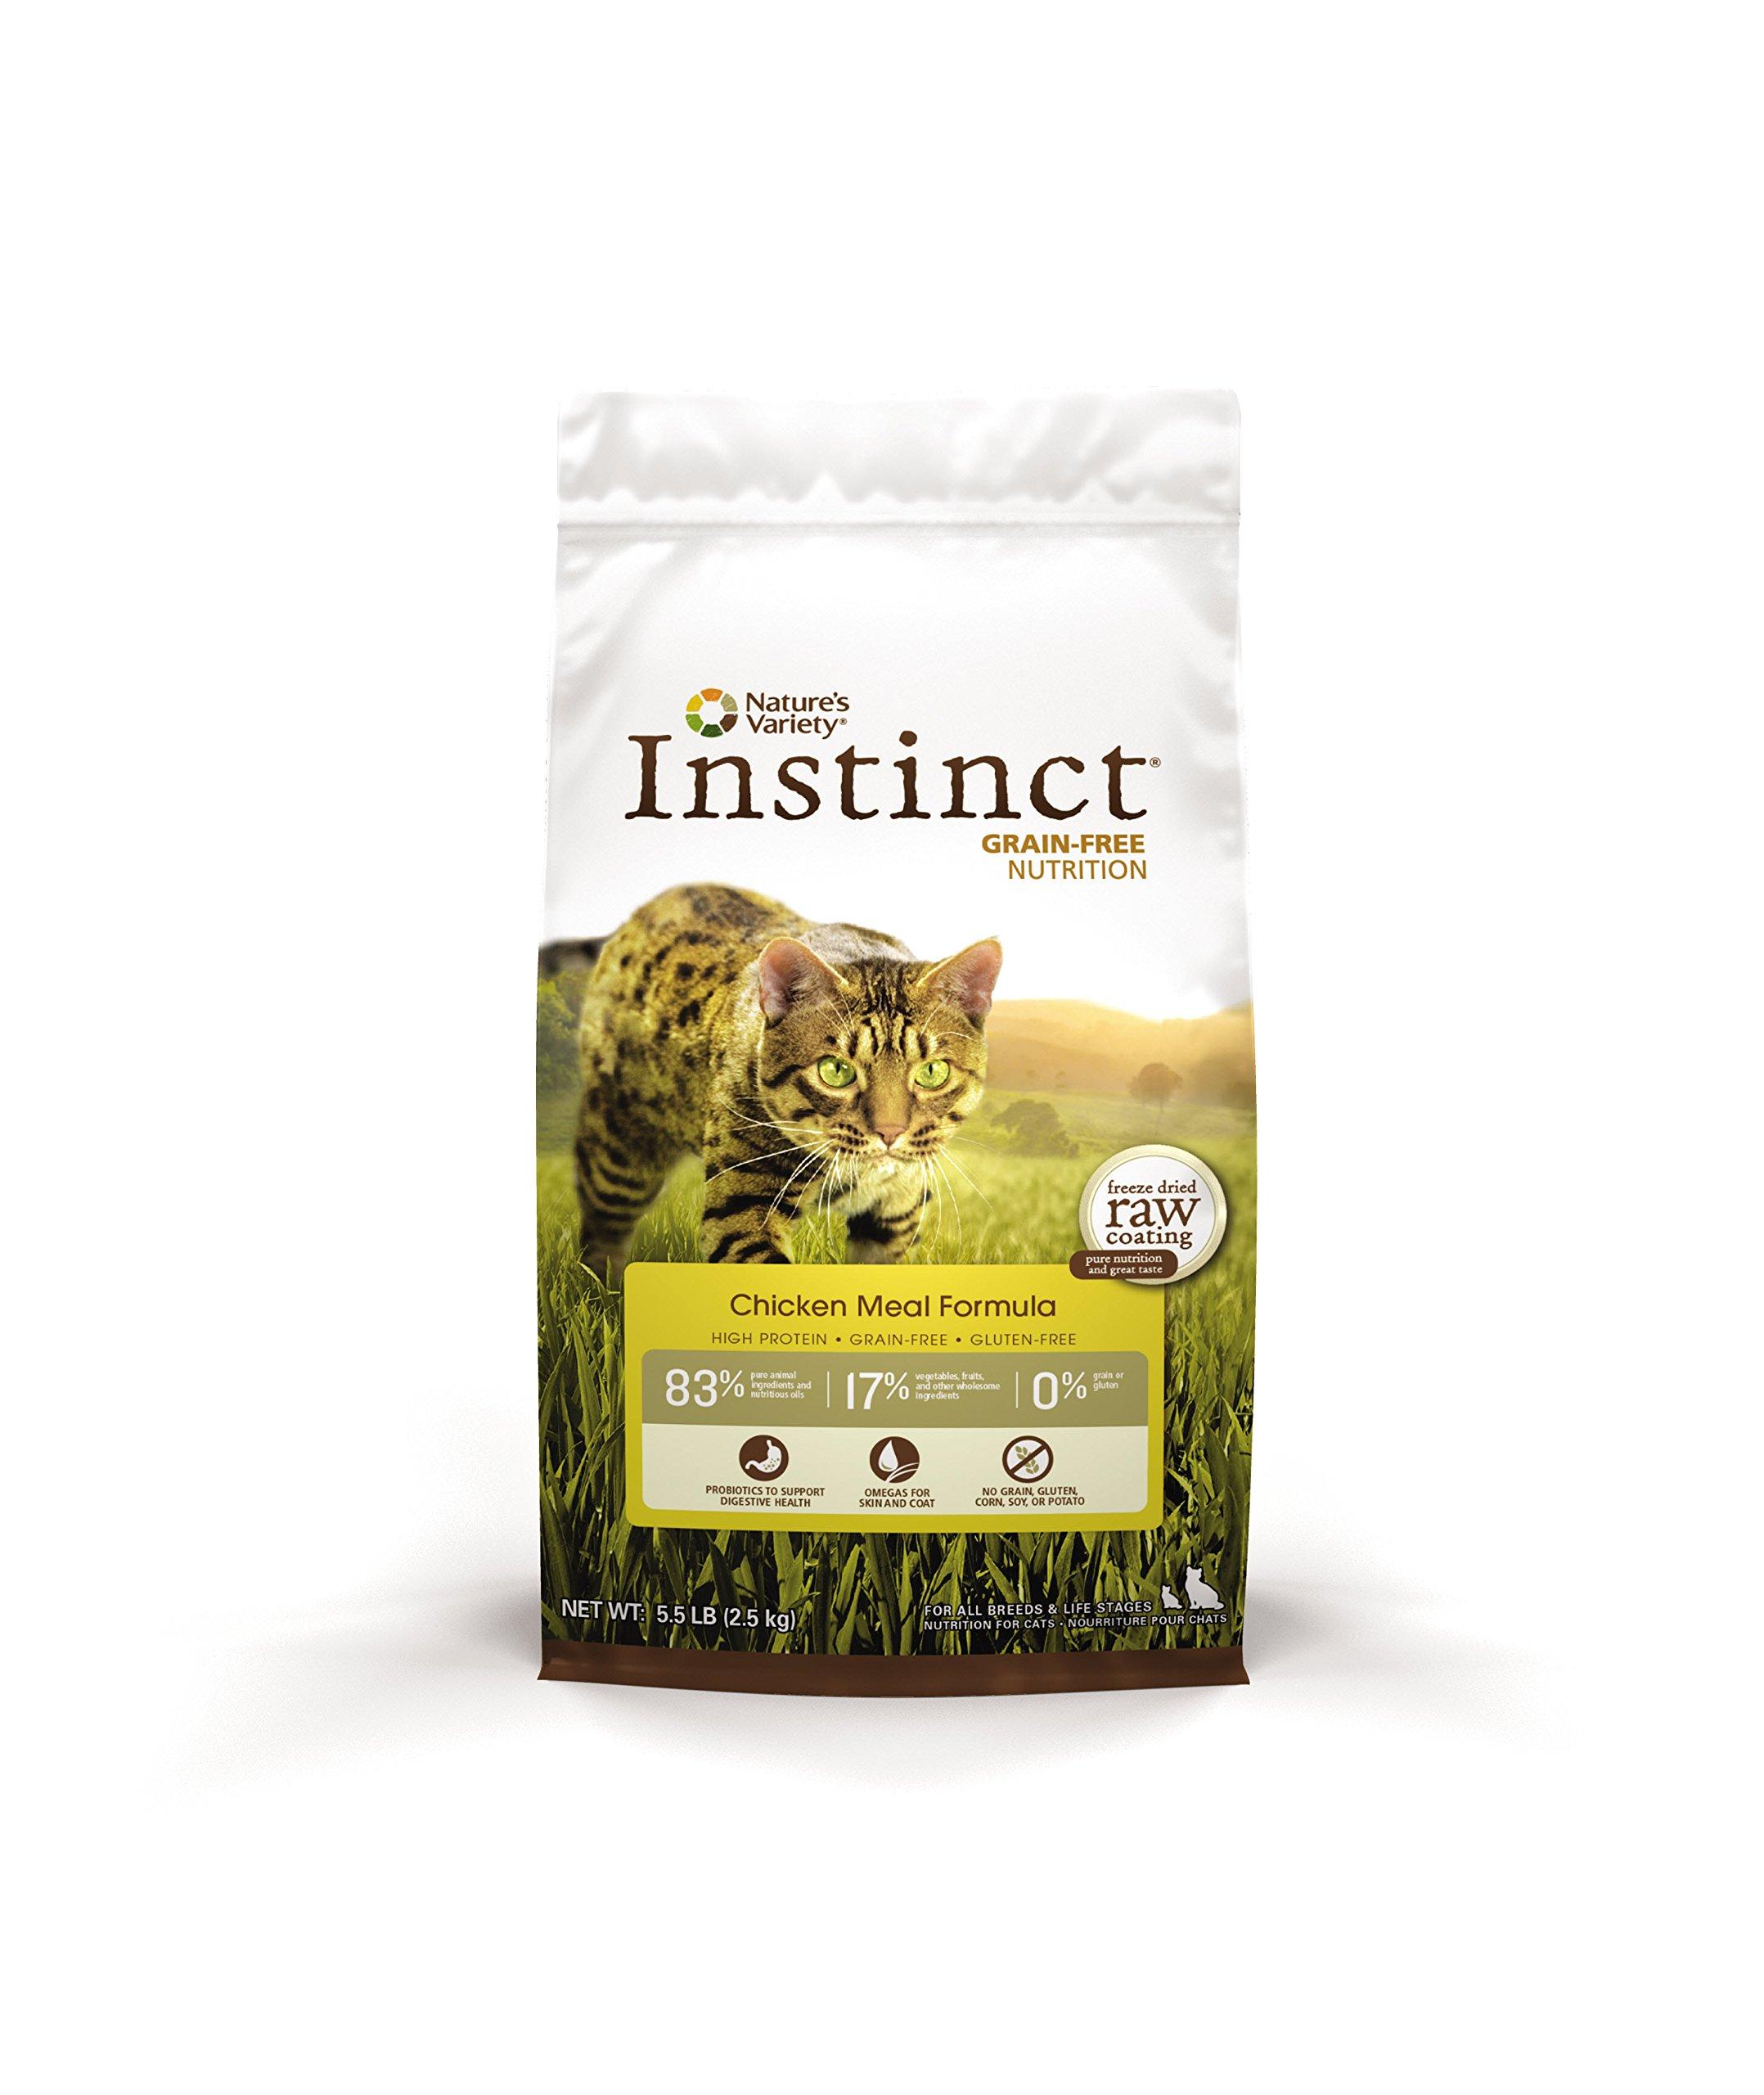 Instinct Dry Cat Food Ingredients